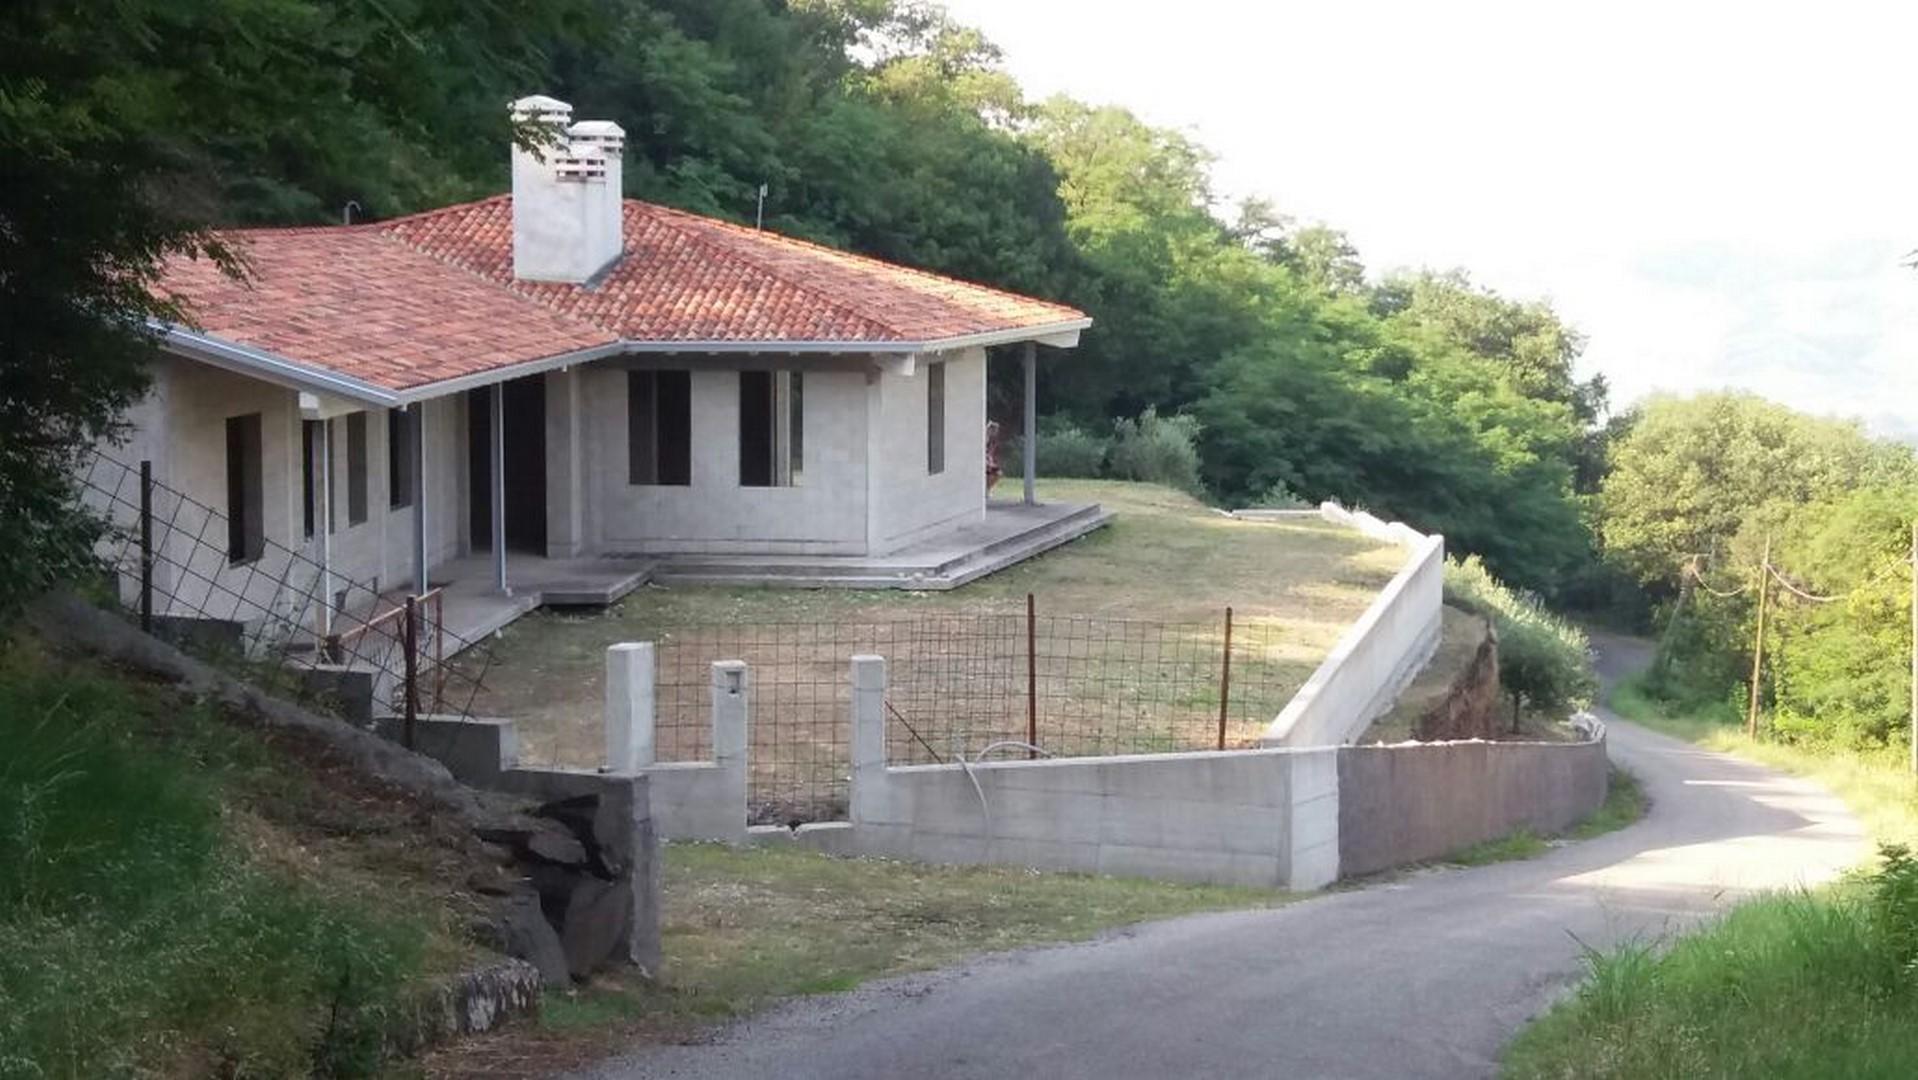 Villa in vendita a Roncà, 10 locali, Trattative riservate | CambioCasa.it